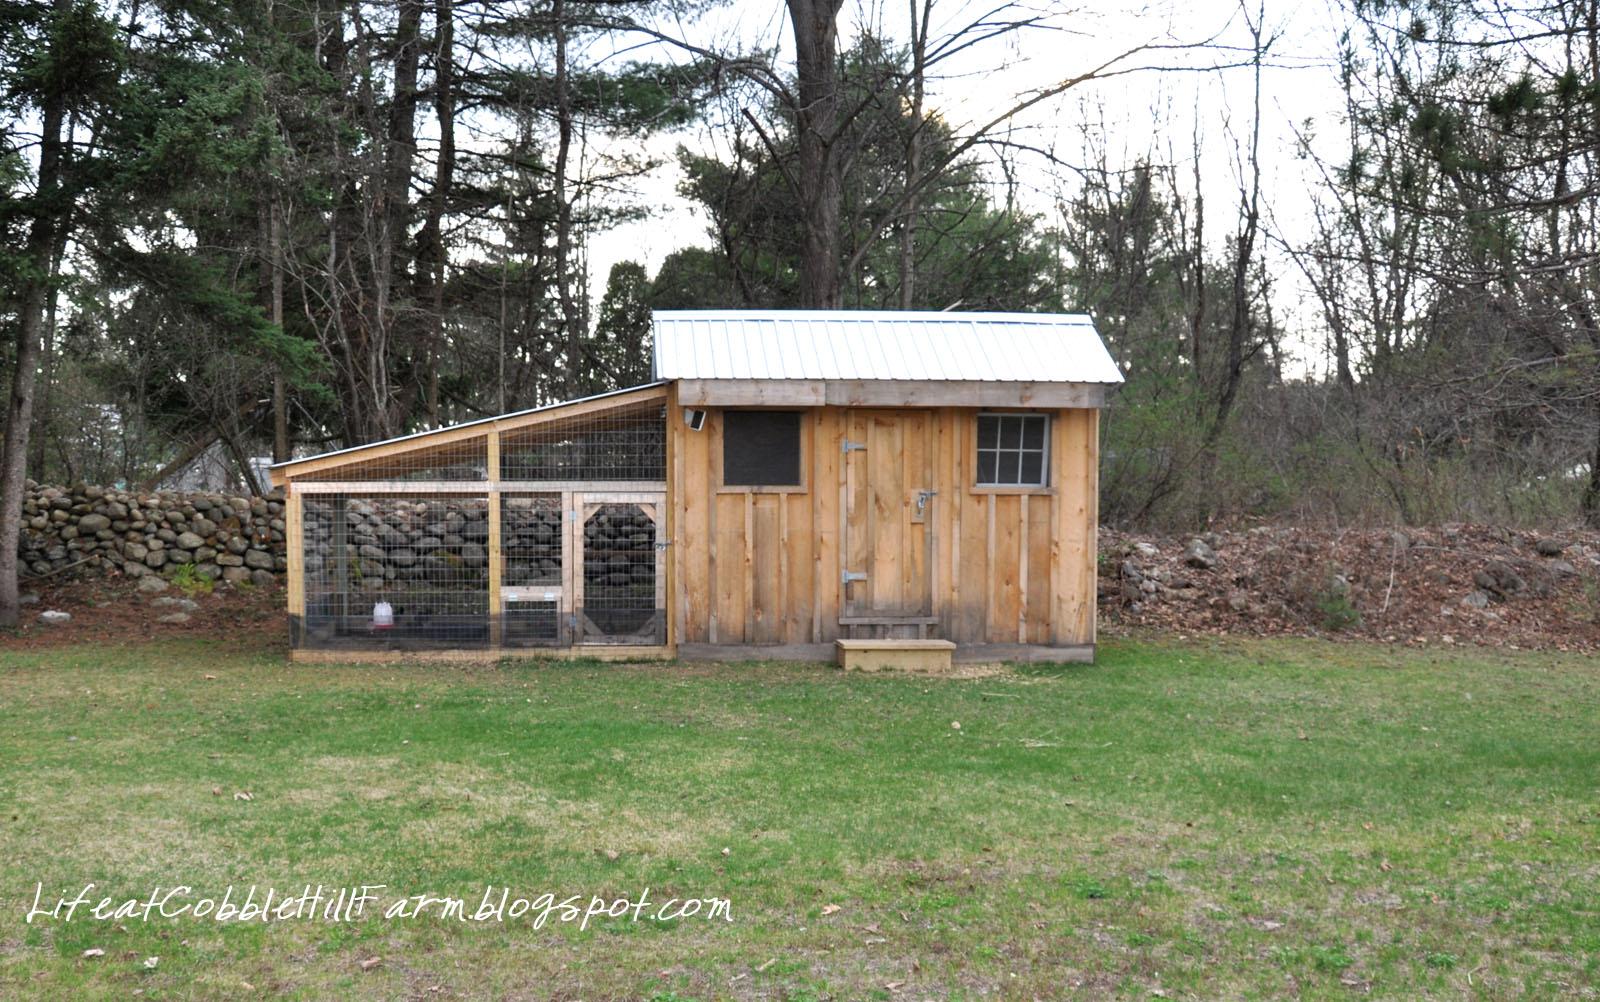 Life At Cobble Hill Farm Chicken Coop 101 Thirteen